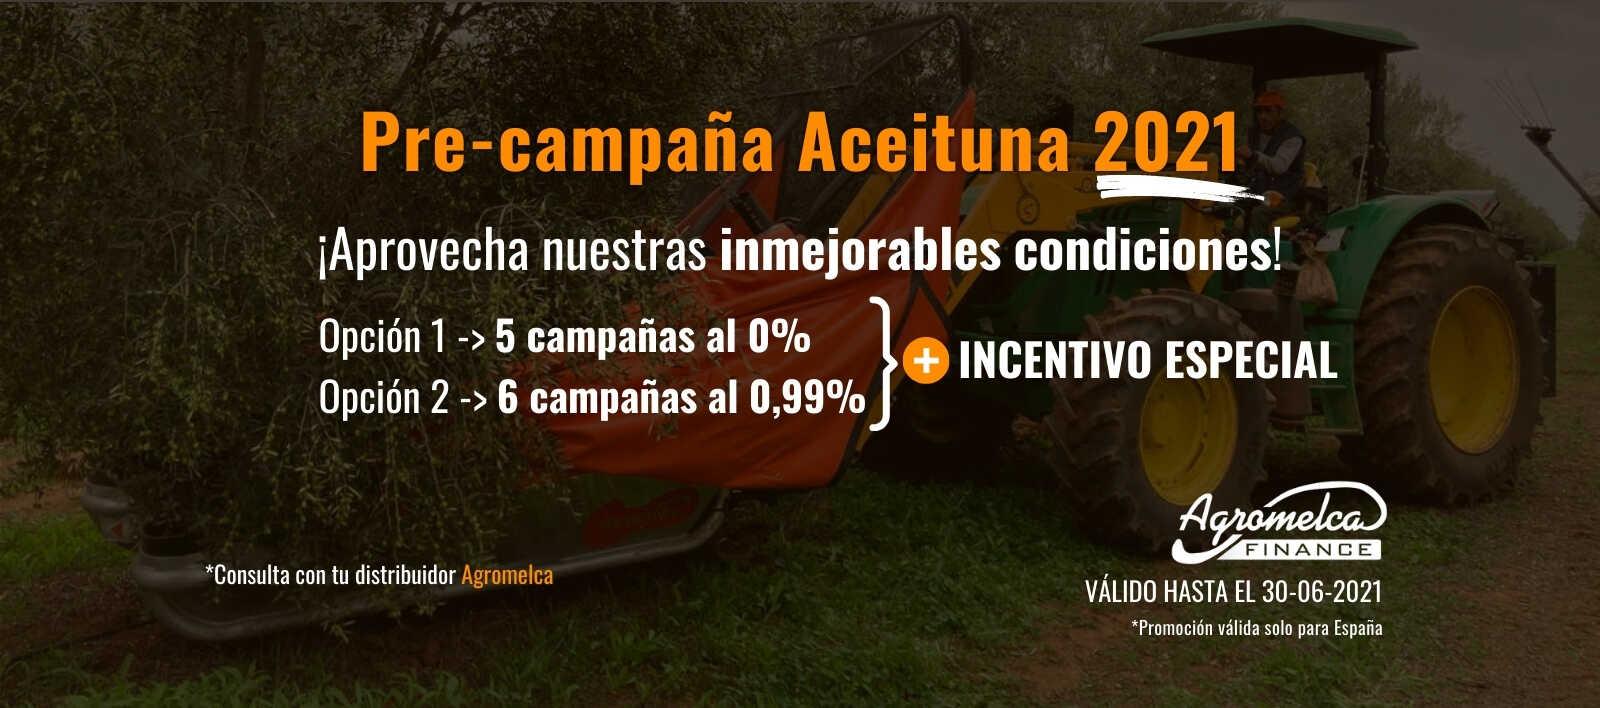 banner-precampana-aceituna-2021-tu-agromelca__optimized